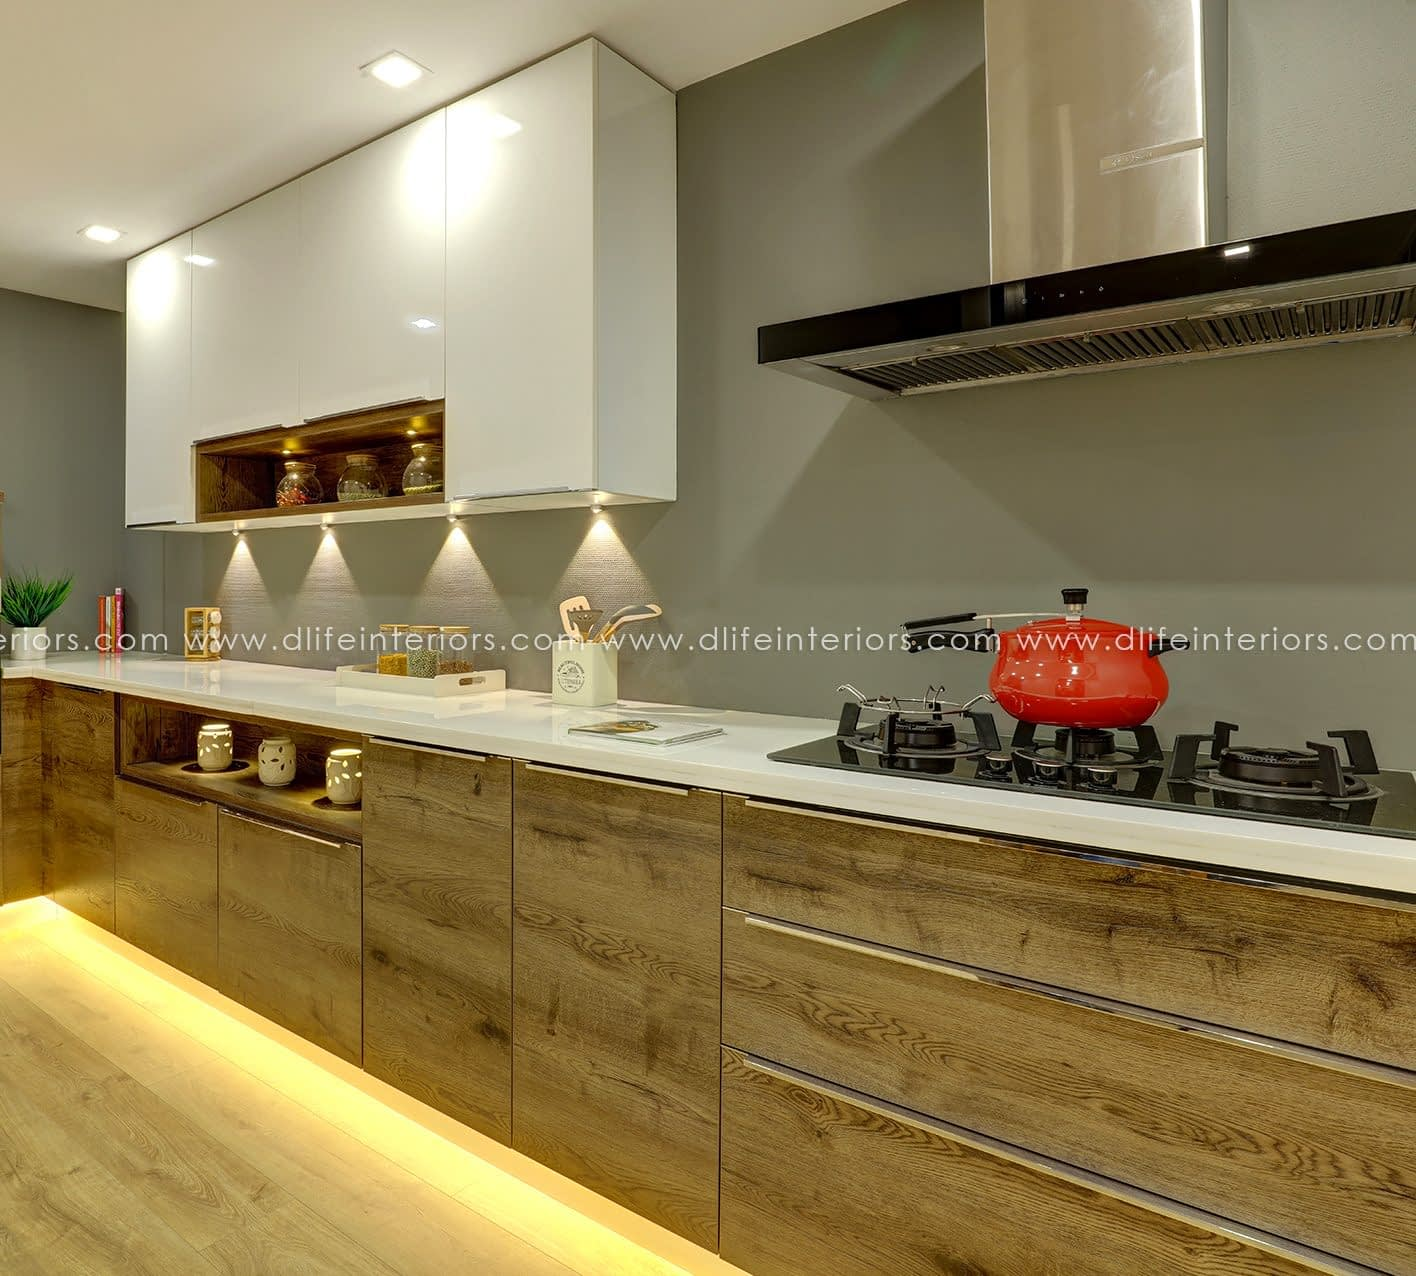 straight kitchen design for apartments